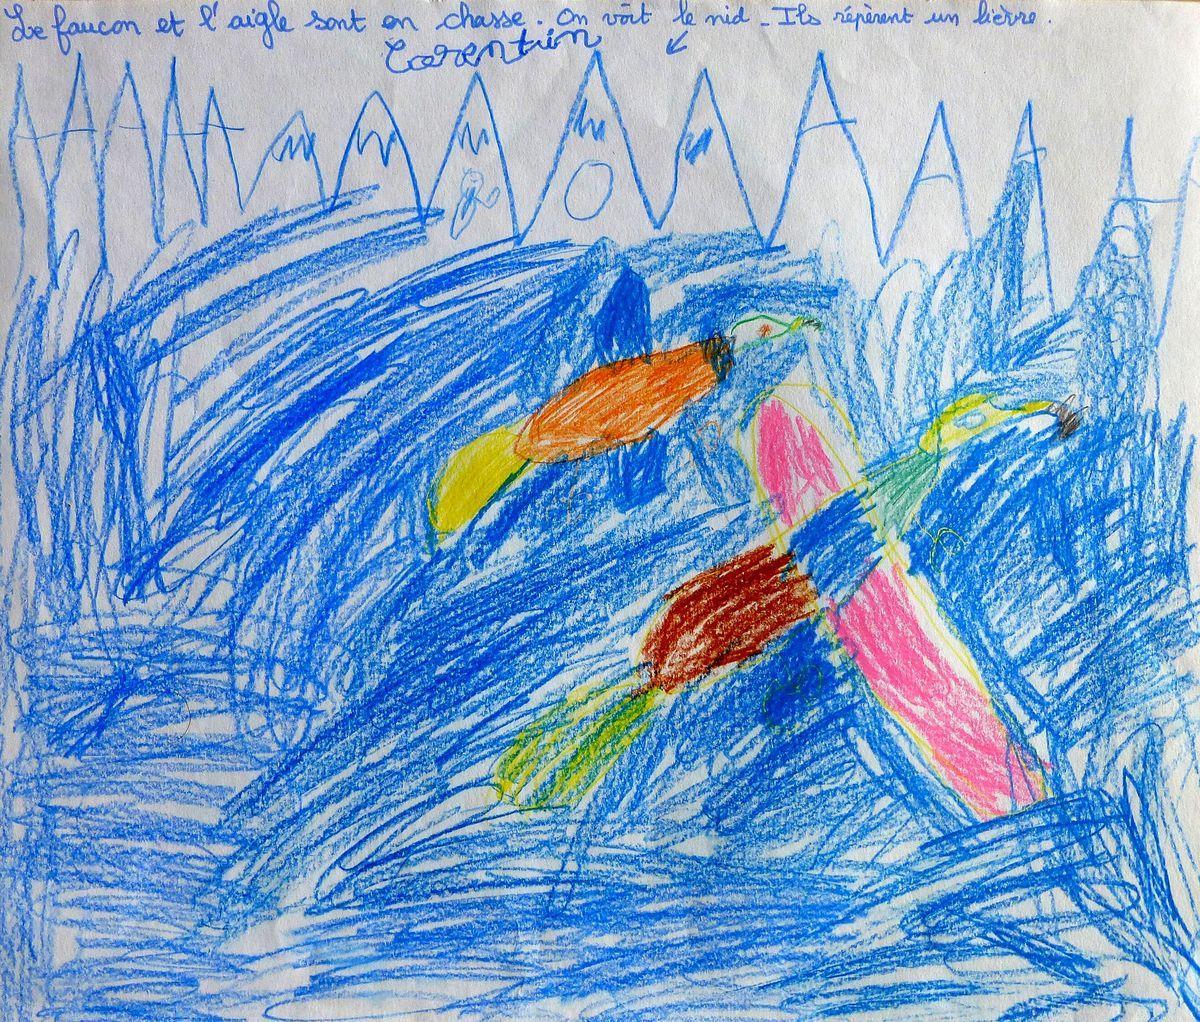 Concours de dessin 2020 - © PNE